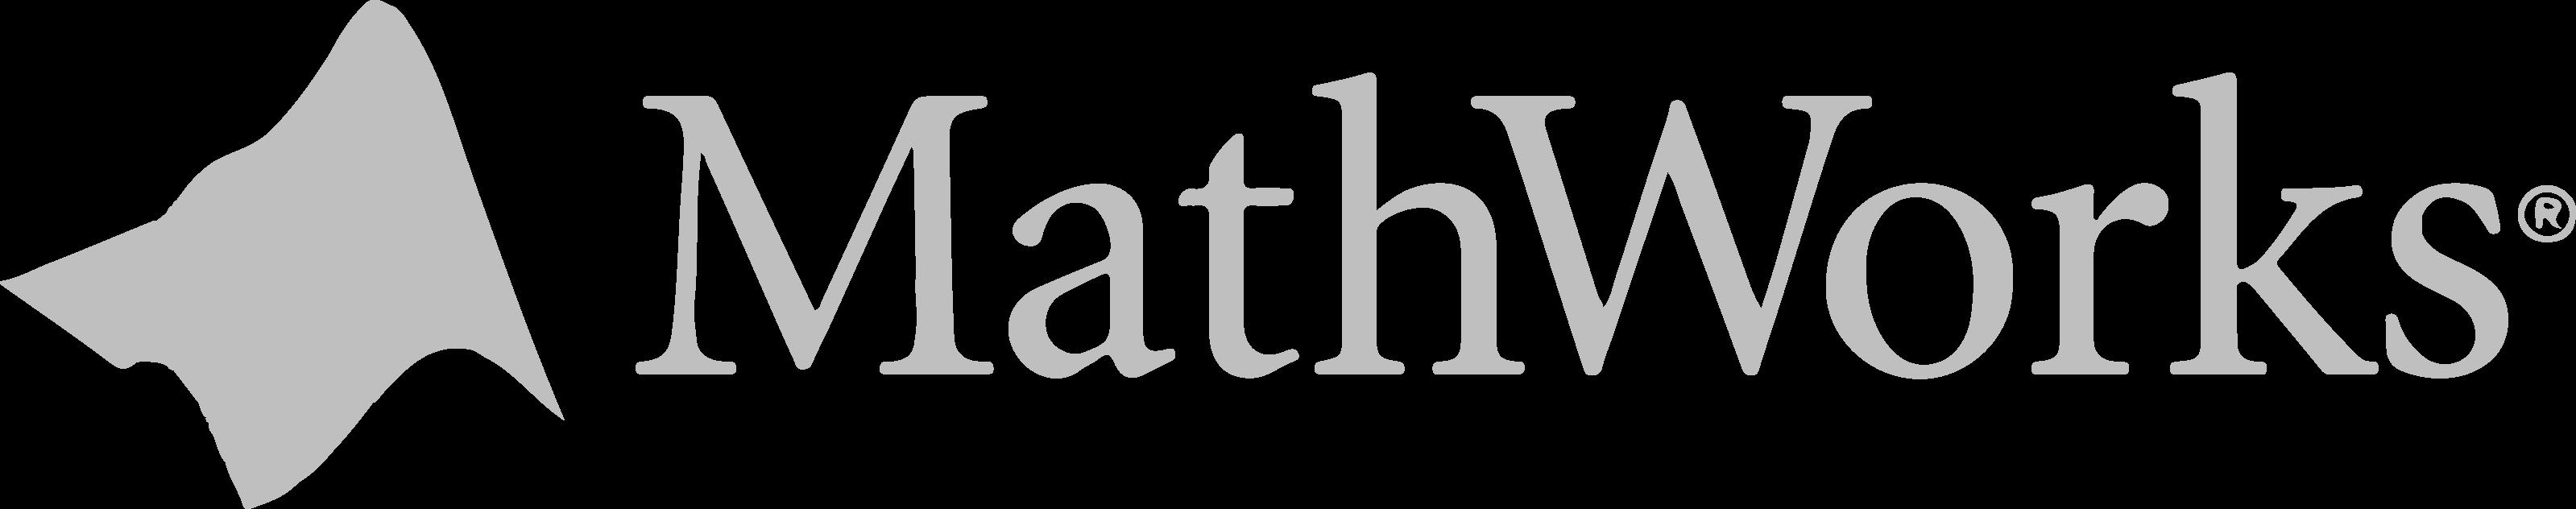 mathworks_gray